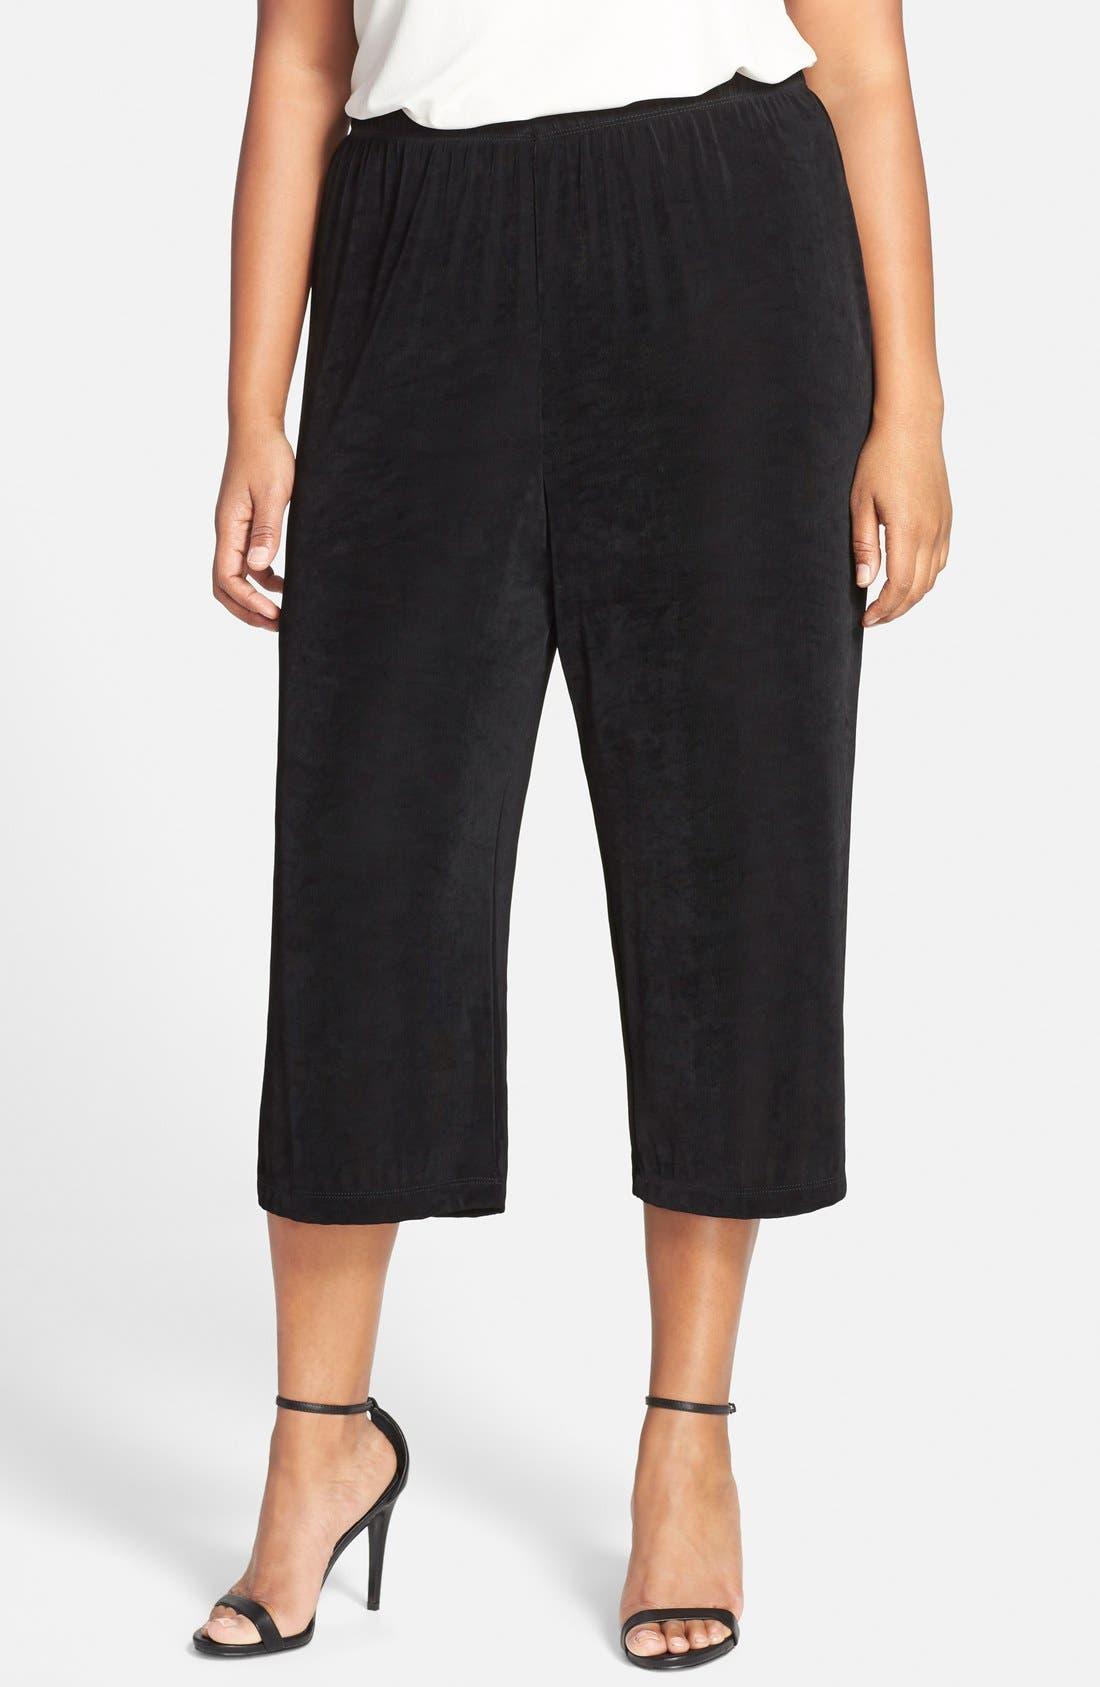 VIKKI VI, High Rise Stretch Knit Crop Pants, Main thumbnail 1, color, BLACK